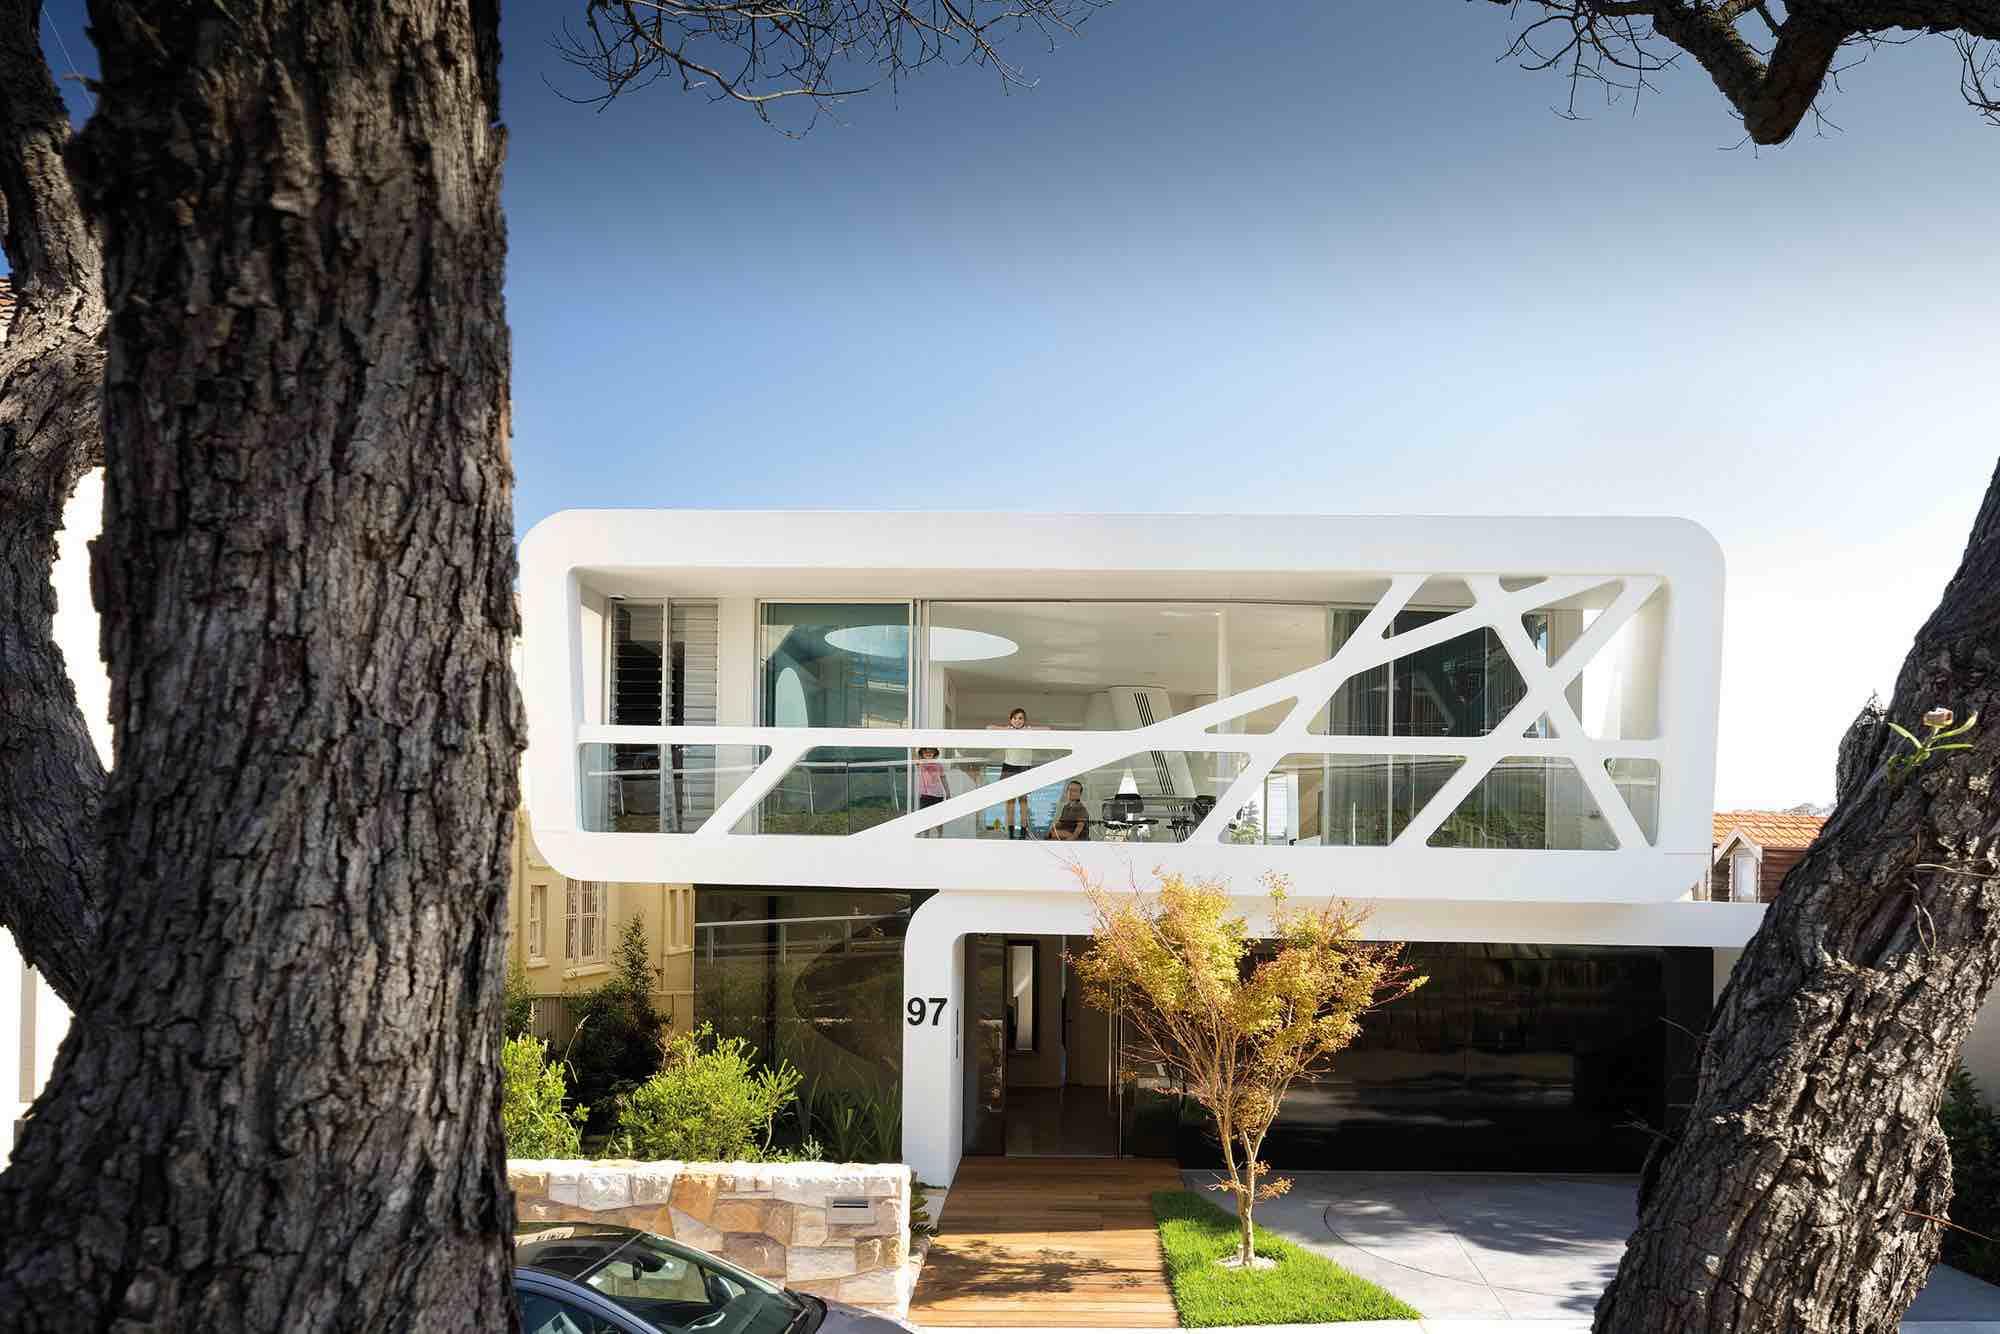 hewlett-street-house-mpr-design-group_hewlett_house10